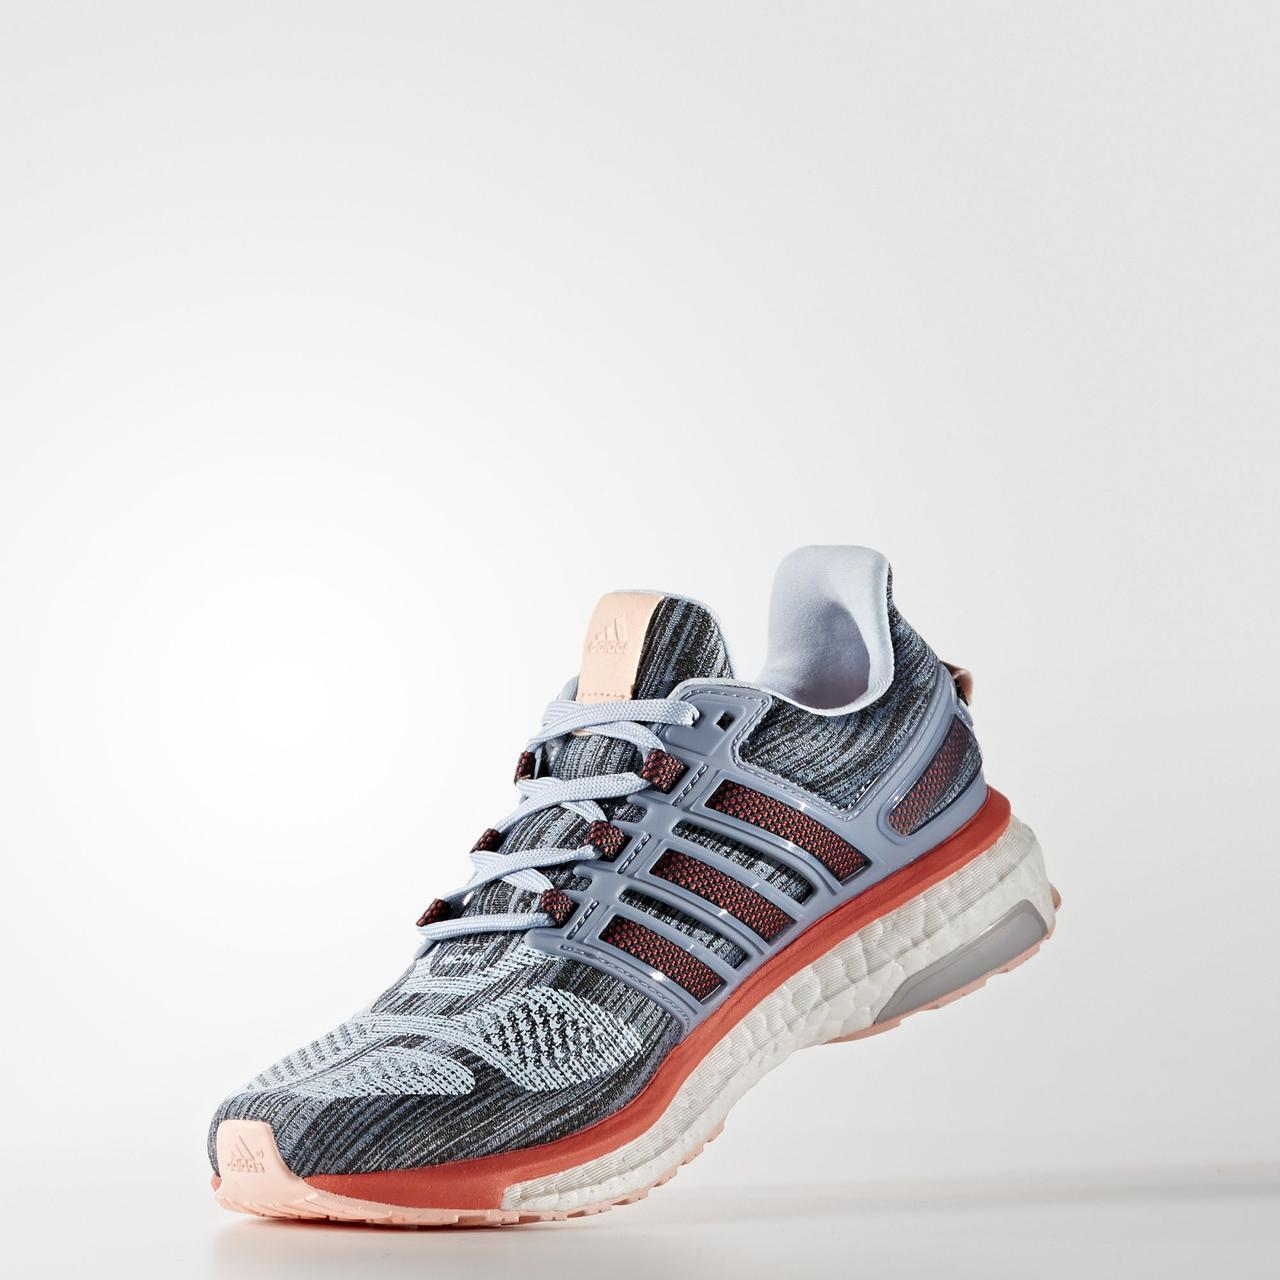 ae12b6e92c33 Женские кроссовки Adidas Performance Energy Boost 3 (Артикул  BB5791) -  Адидас официальный интернет